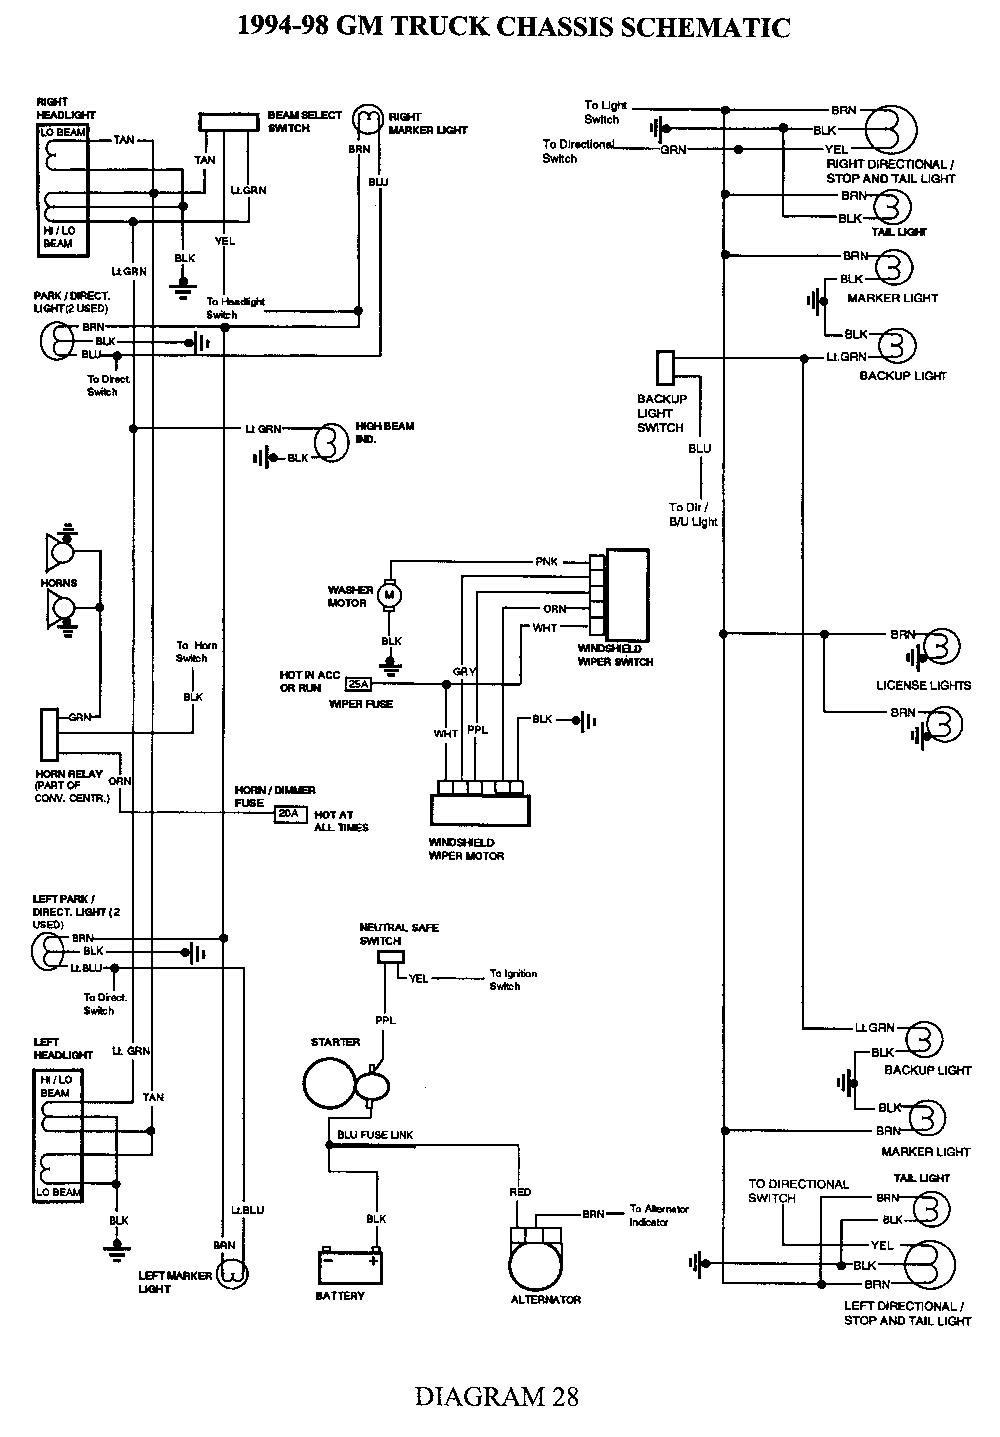 Wiring Diagram 2000 Chevy S10 Rear End Wiring Diagram Used 2000 Chevy S10 Brake Light Wiring Diagram 2000 Chevy S10 Rear Lights Wiring Diagram